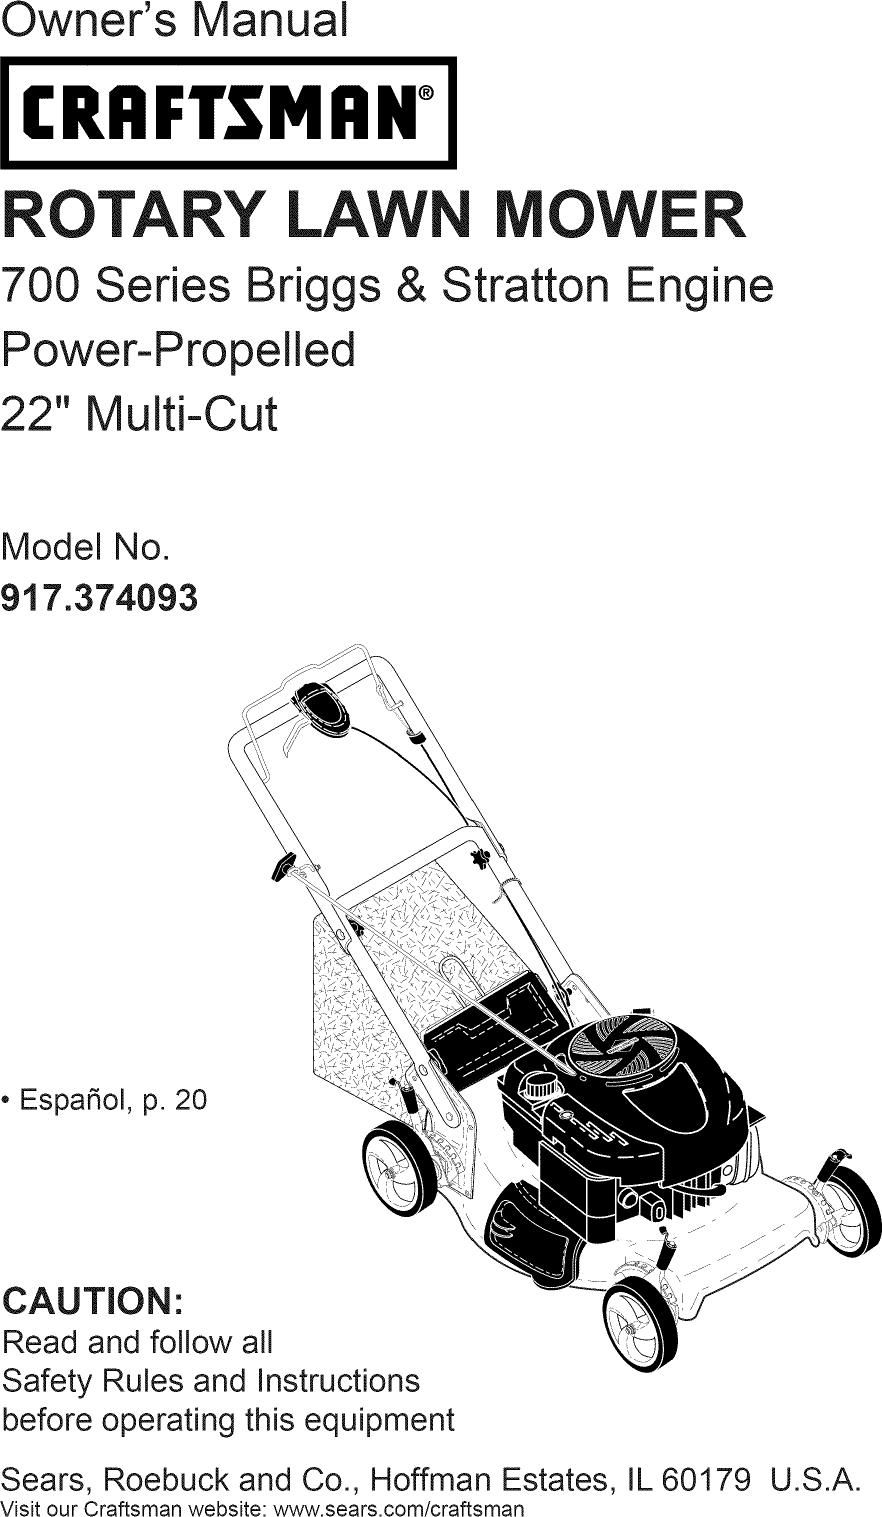 Craftsman 917374093 L1003101 User Manual LAWN MOWER